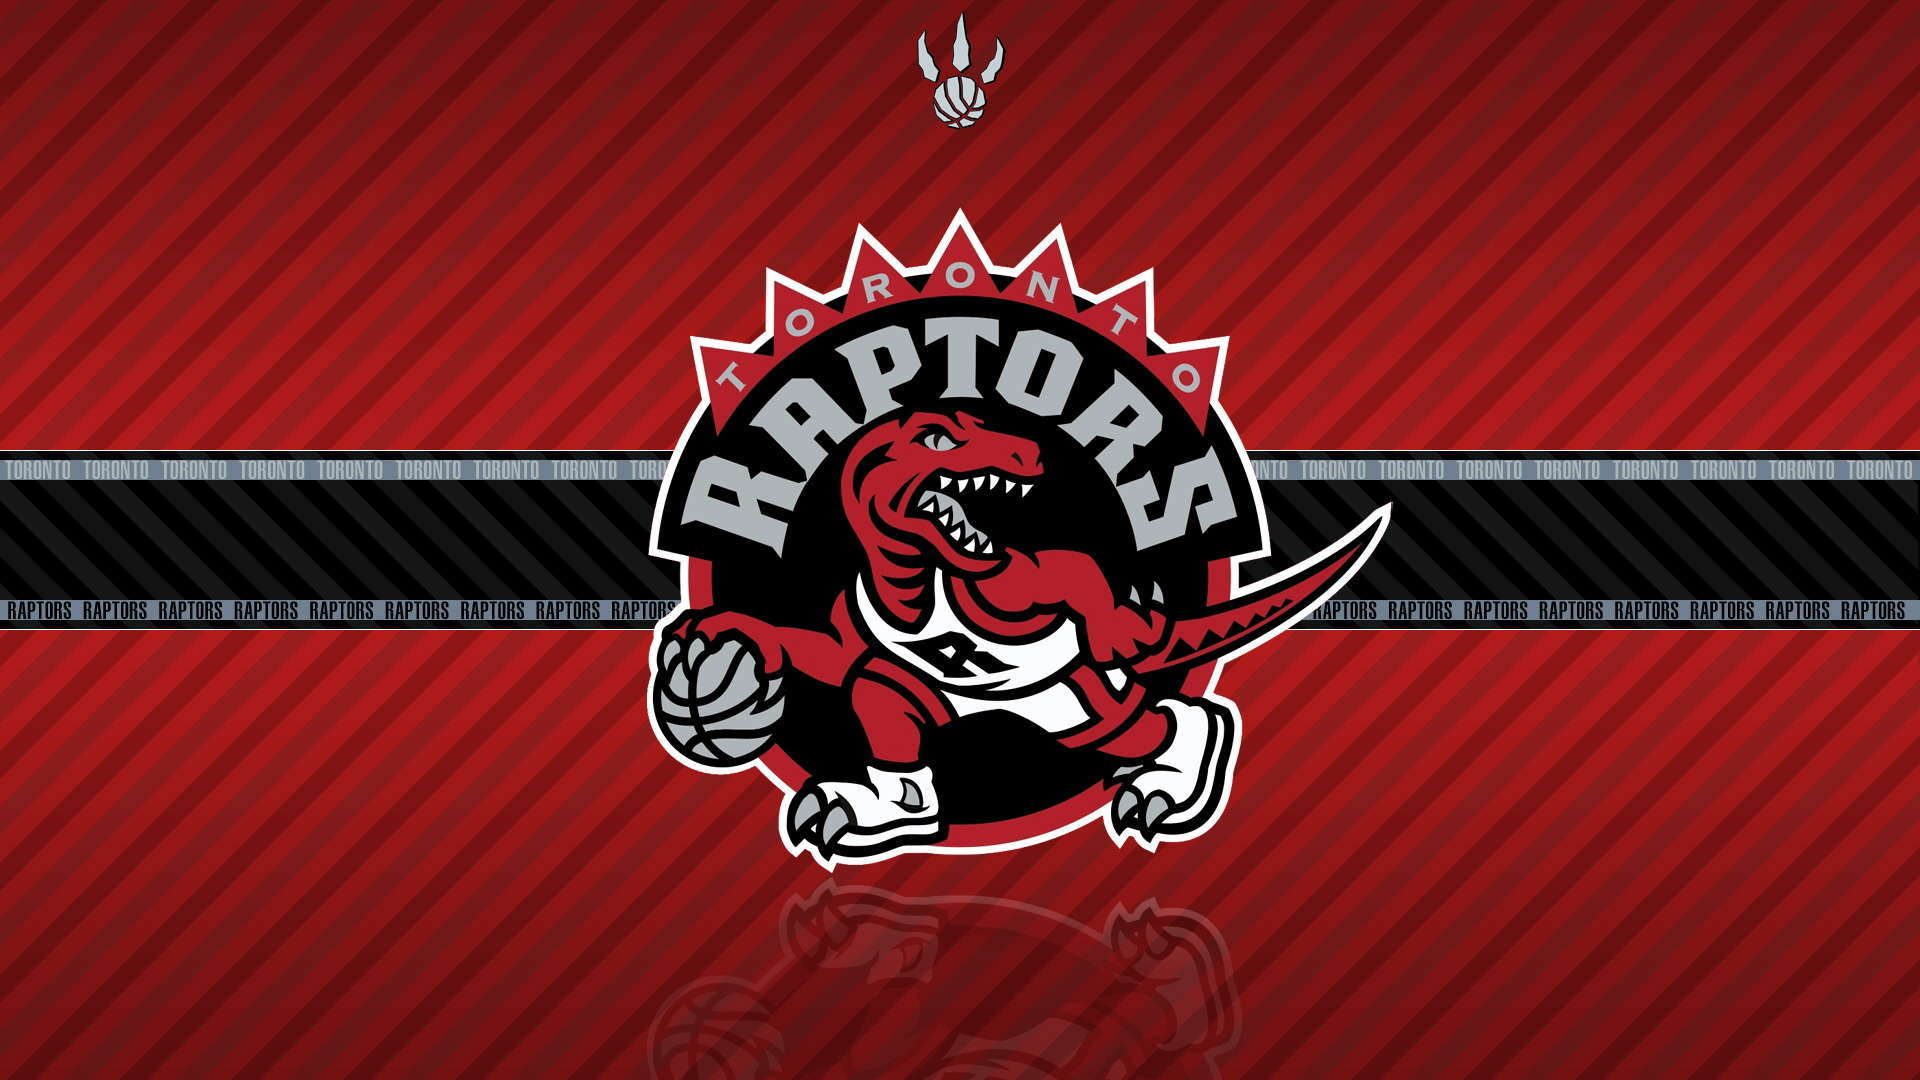 Toronto raptors wallpapers wallpaper cave - Toronto raptors logo wallpaper ...